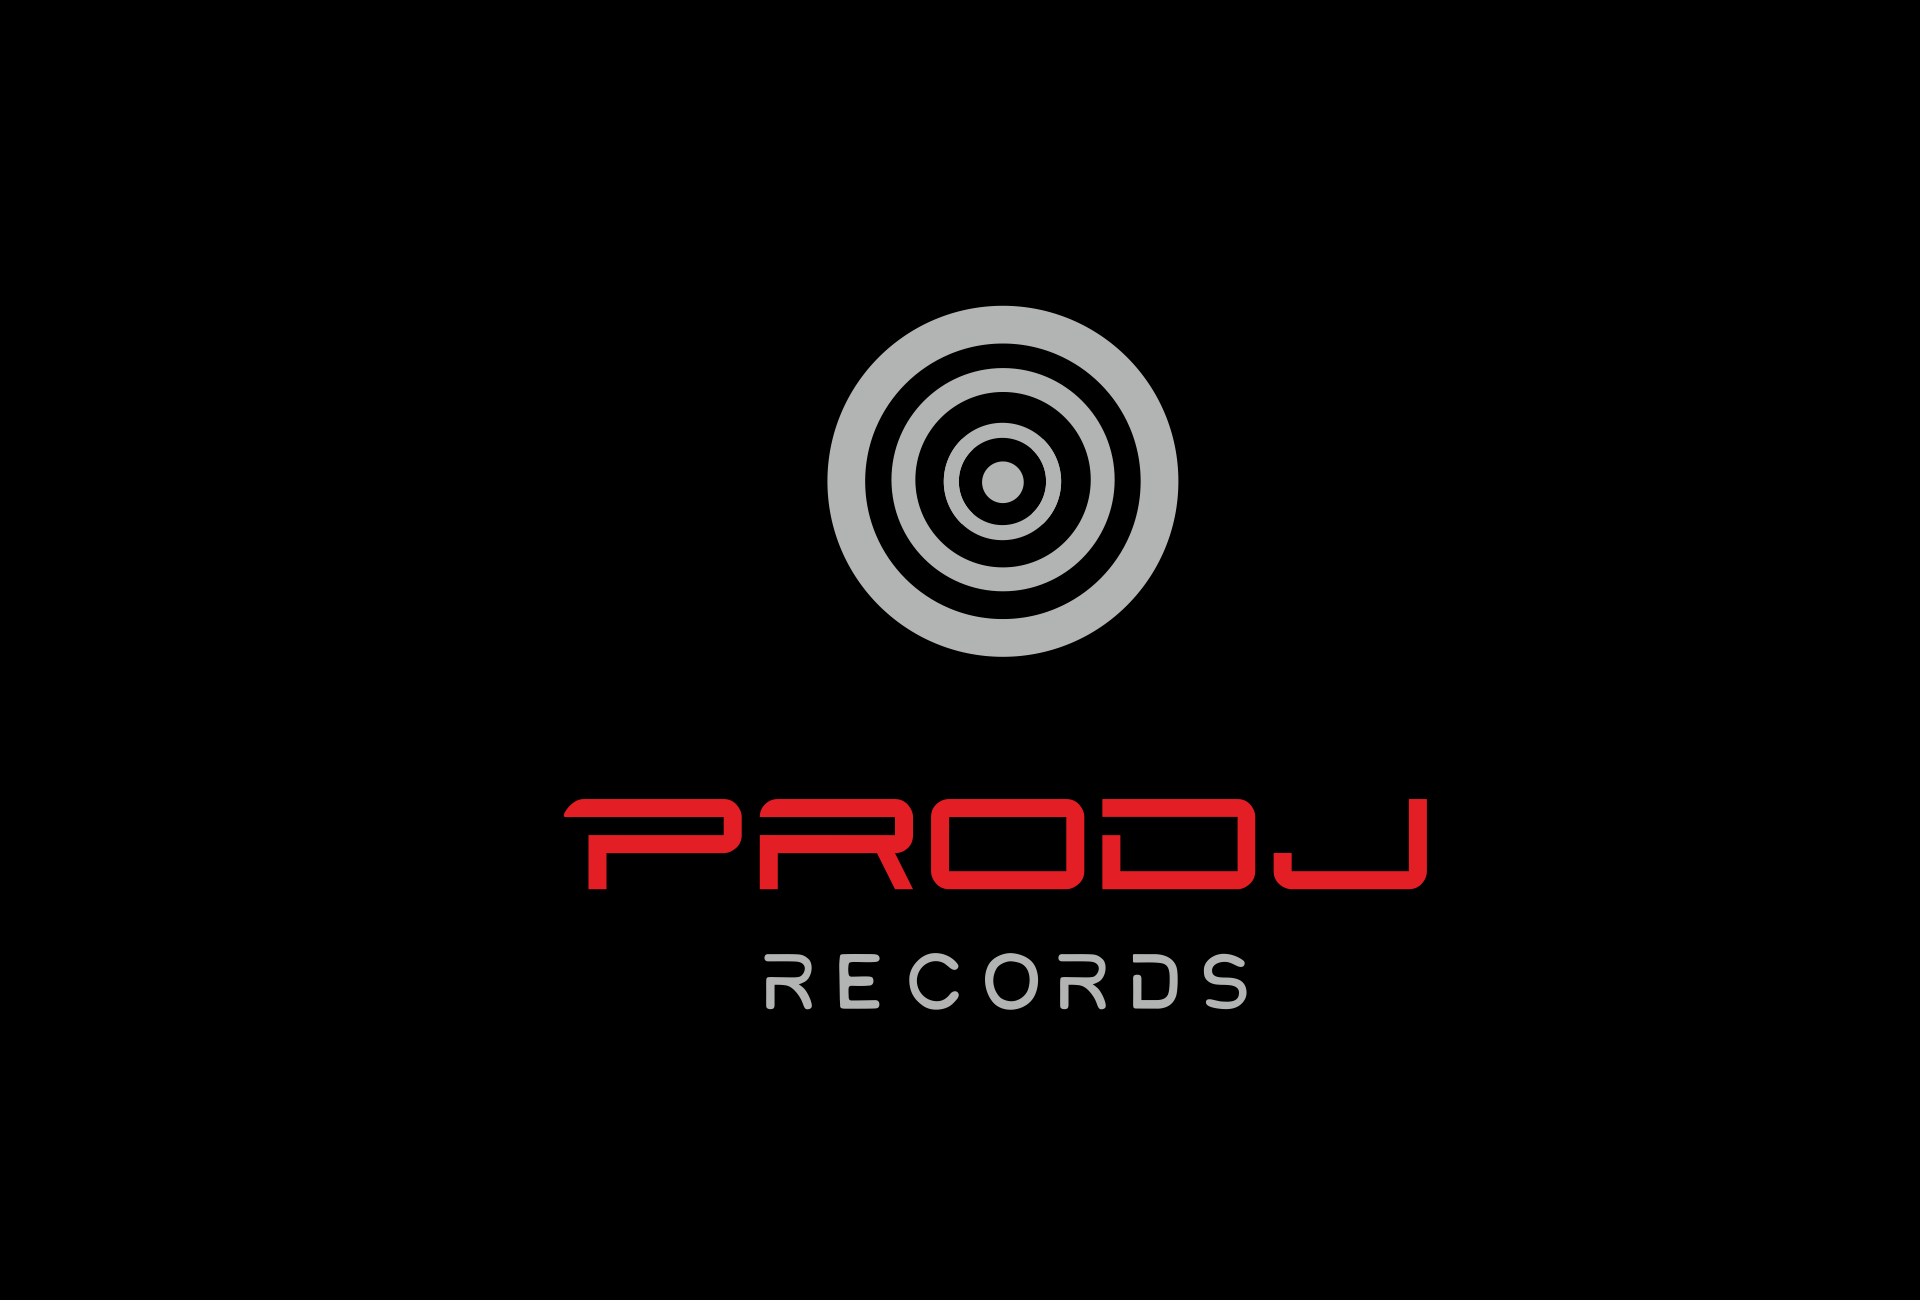 prodj_records_sign_3c